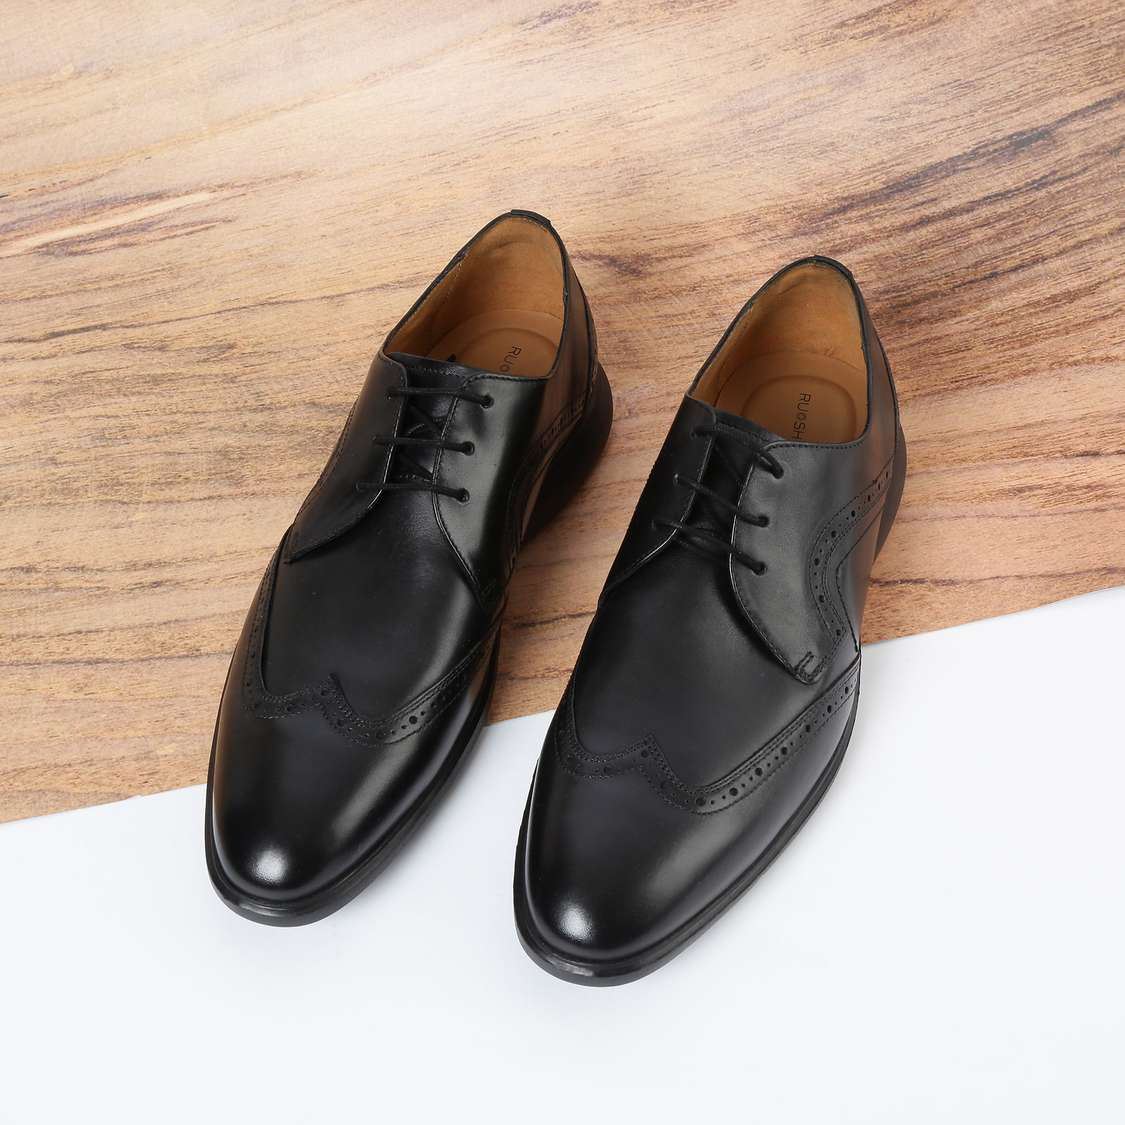 RUOSH Genuine Leather Wingtip Semi-Brogue Derby Shoes